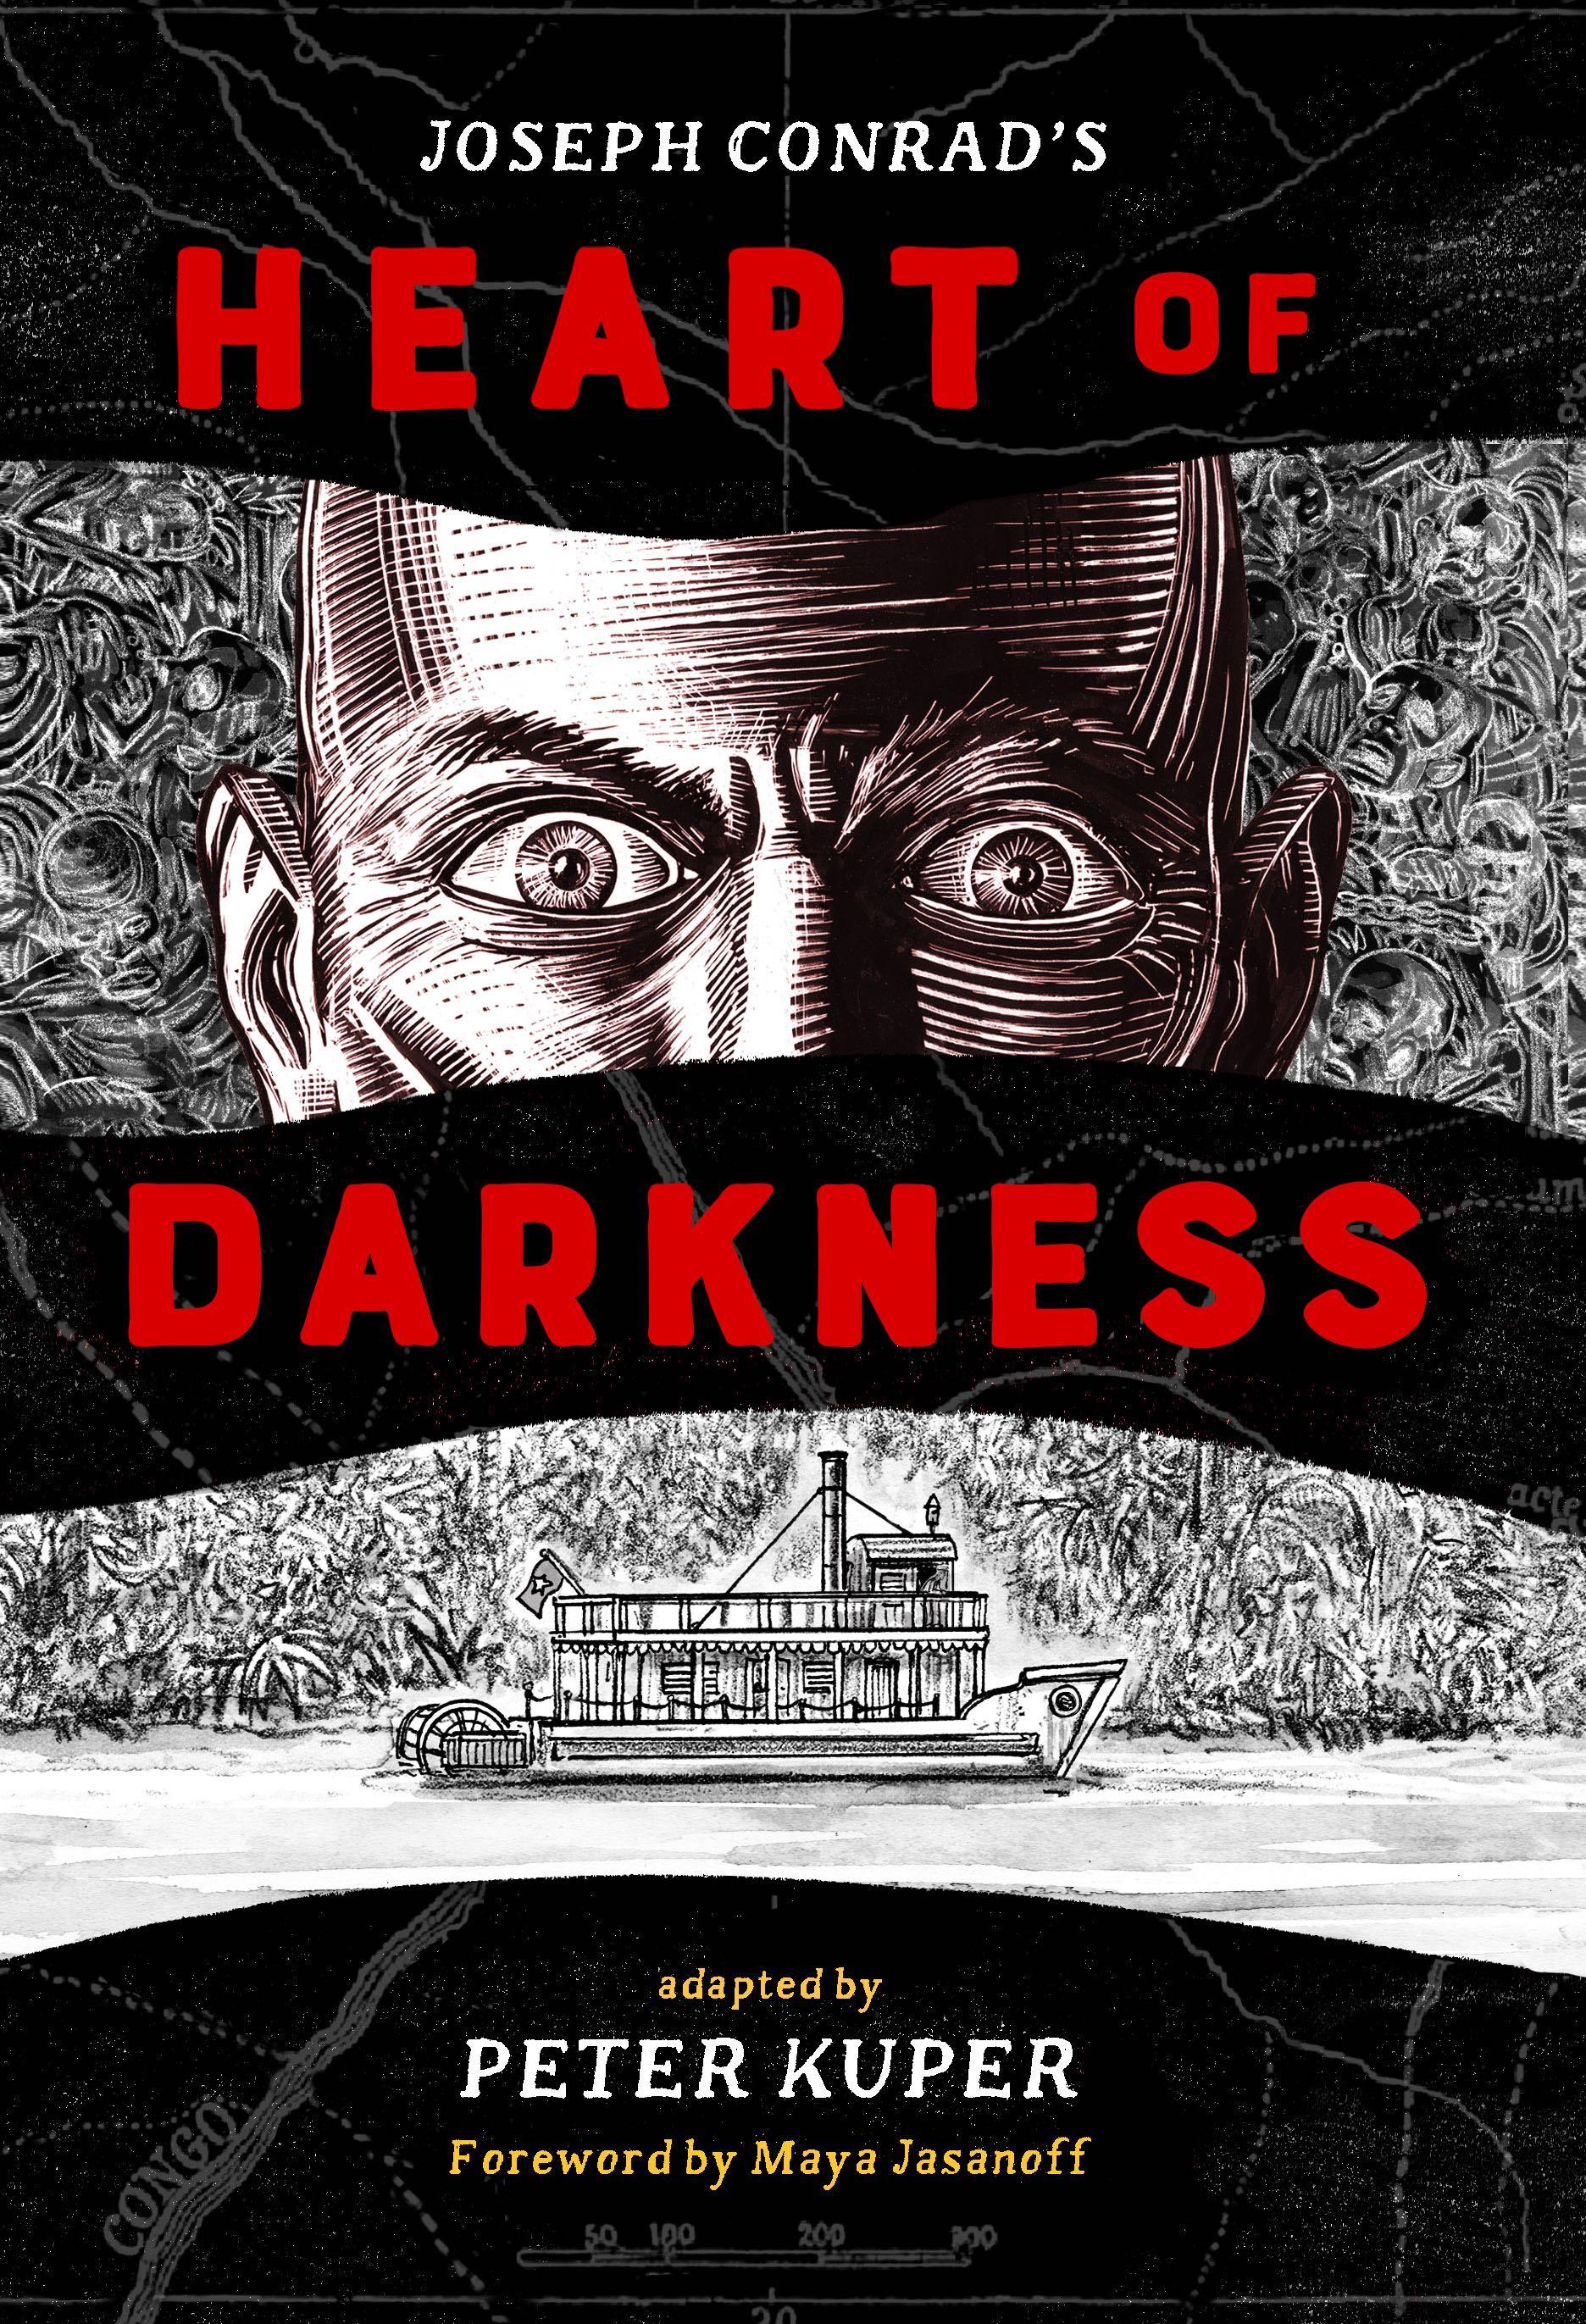 Heart of Darkness Peter kuper